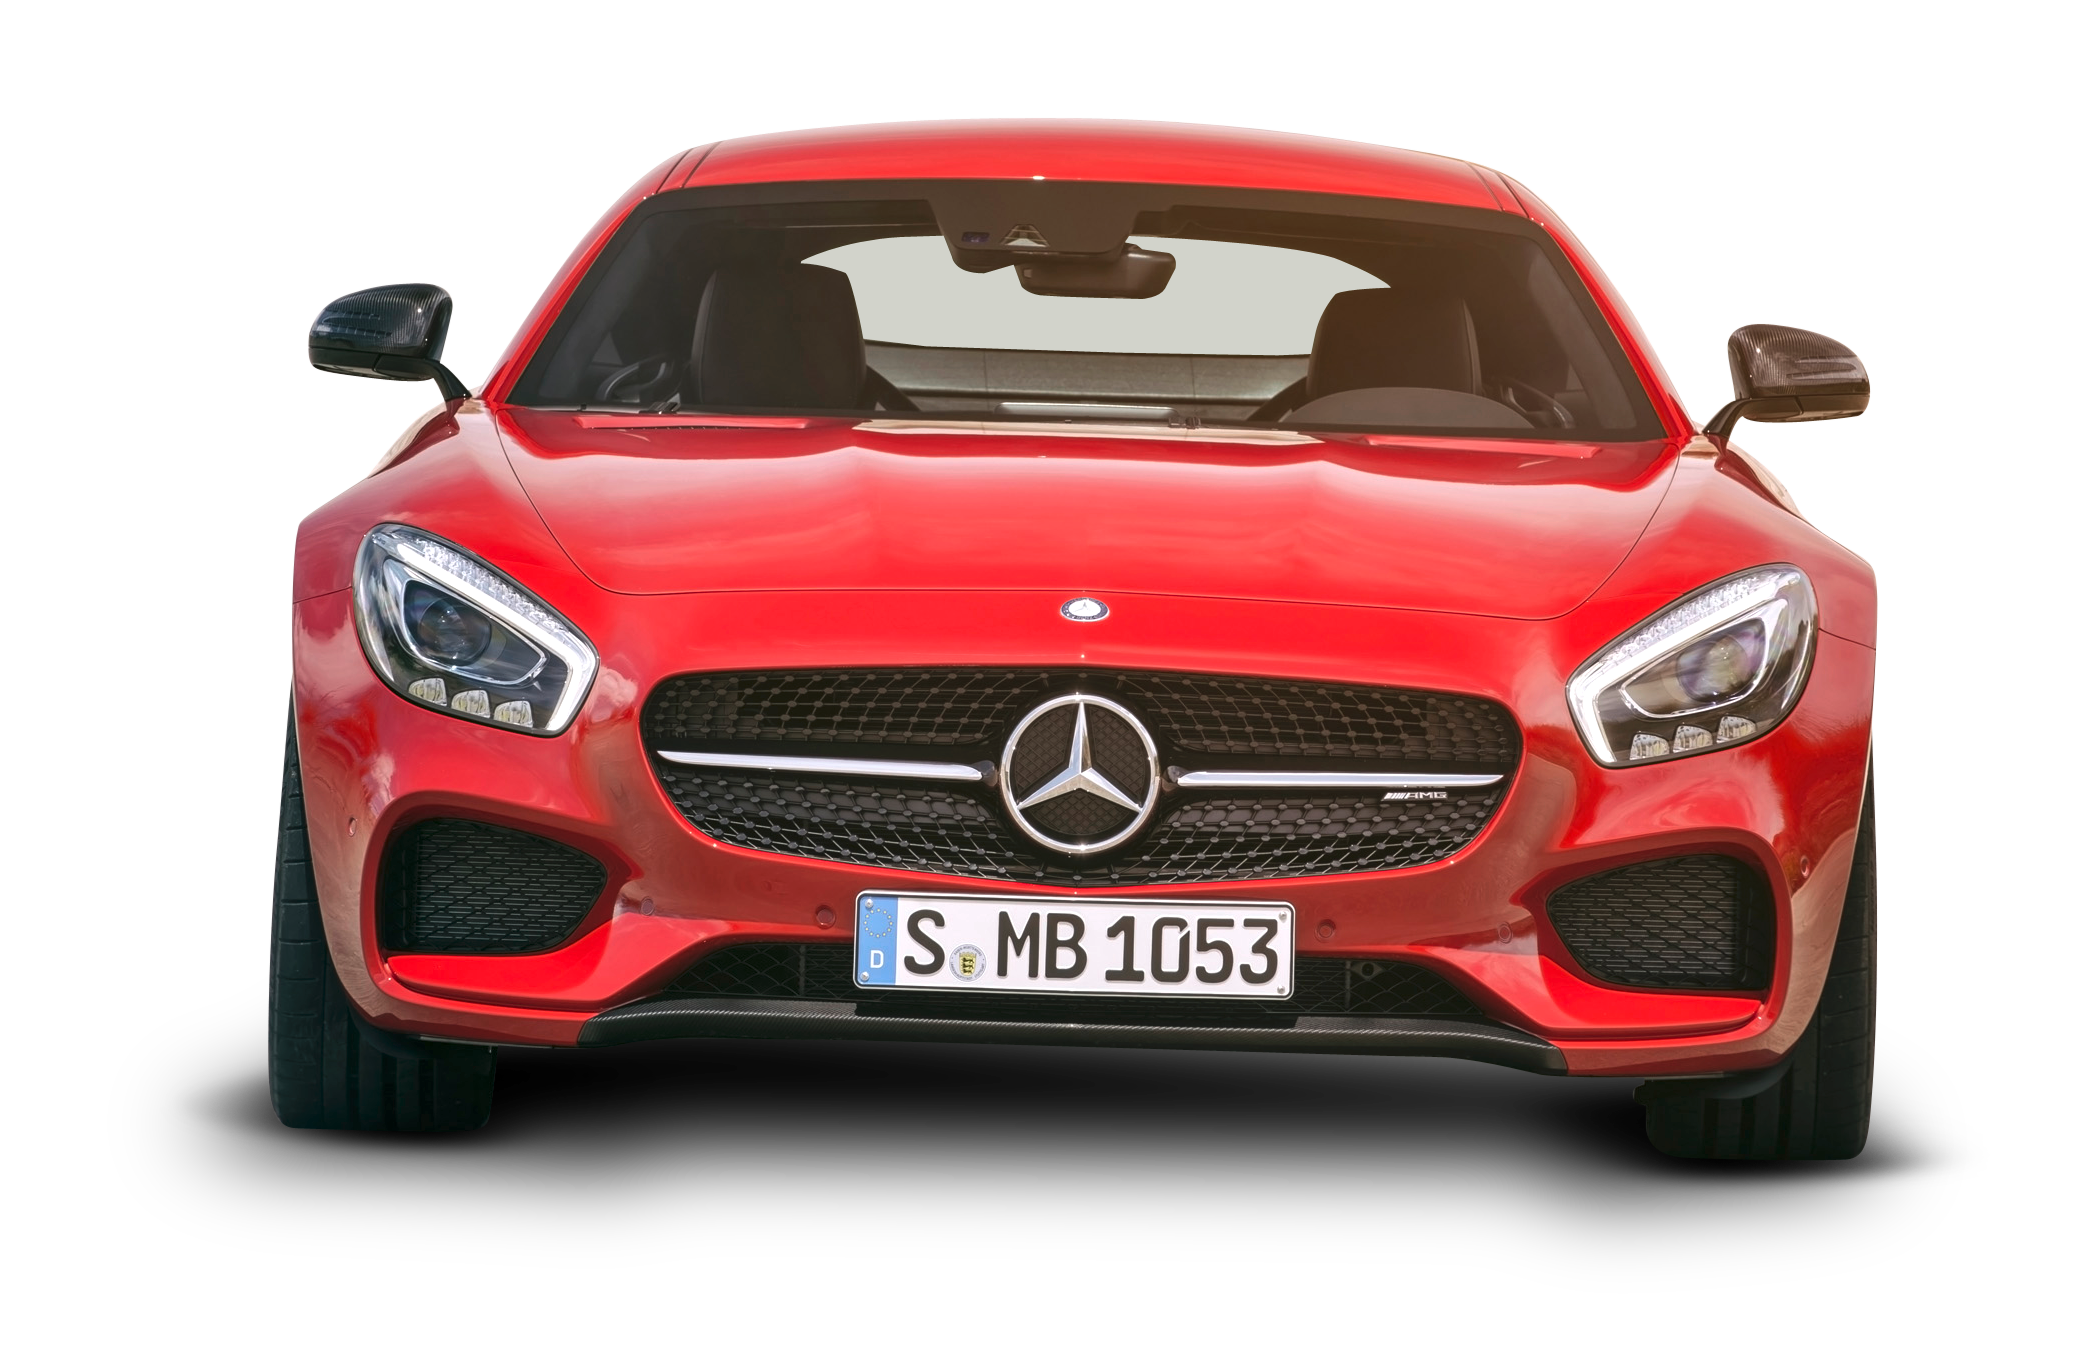 Mercedes Car Front Png image